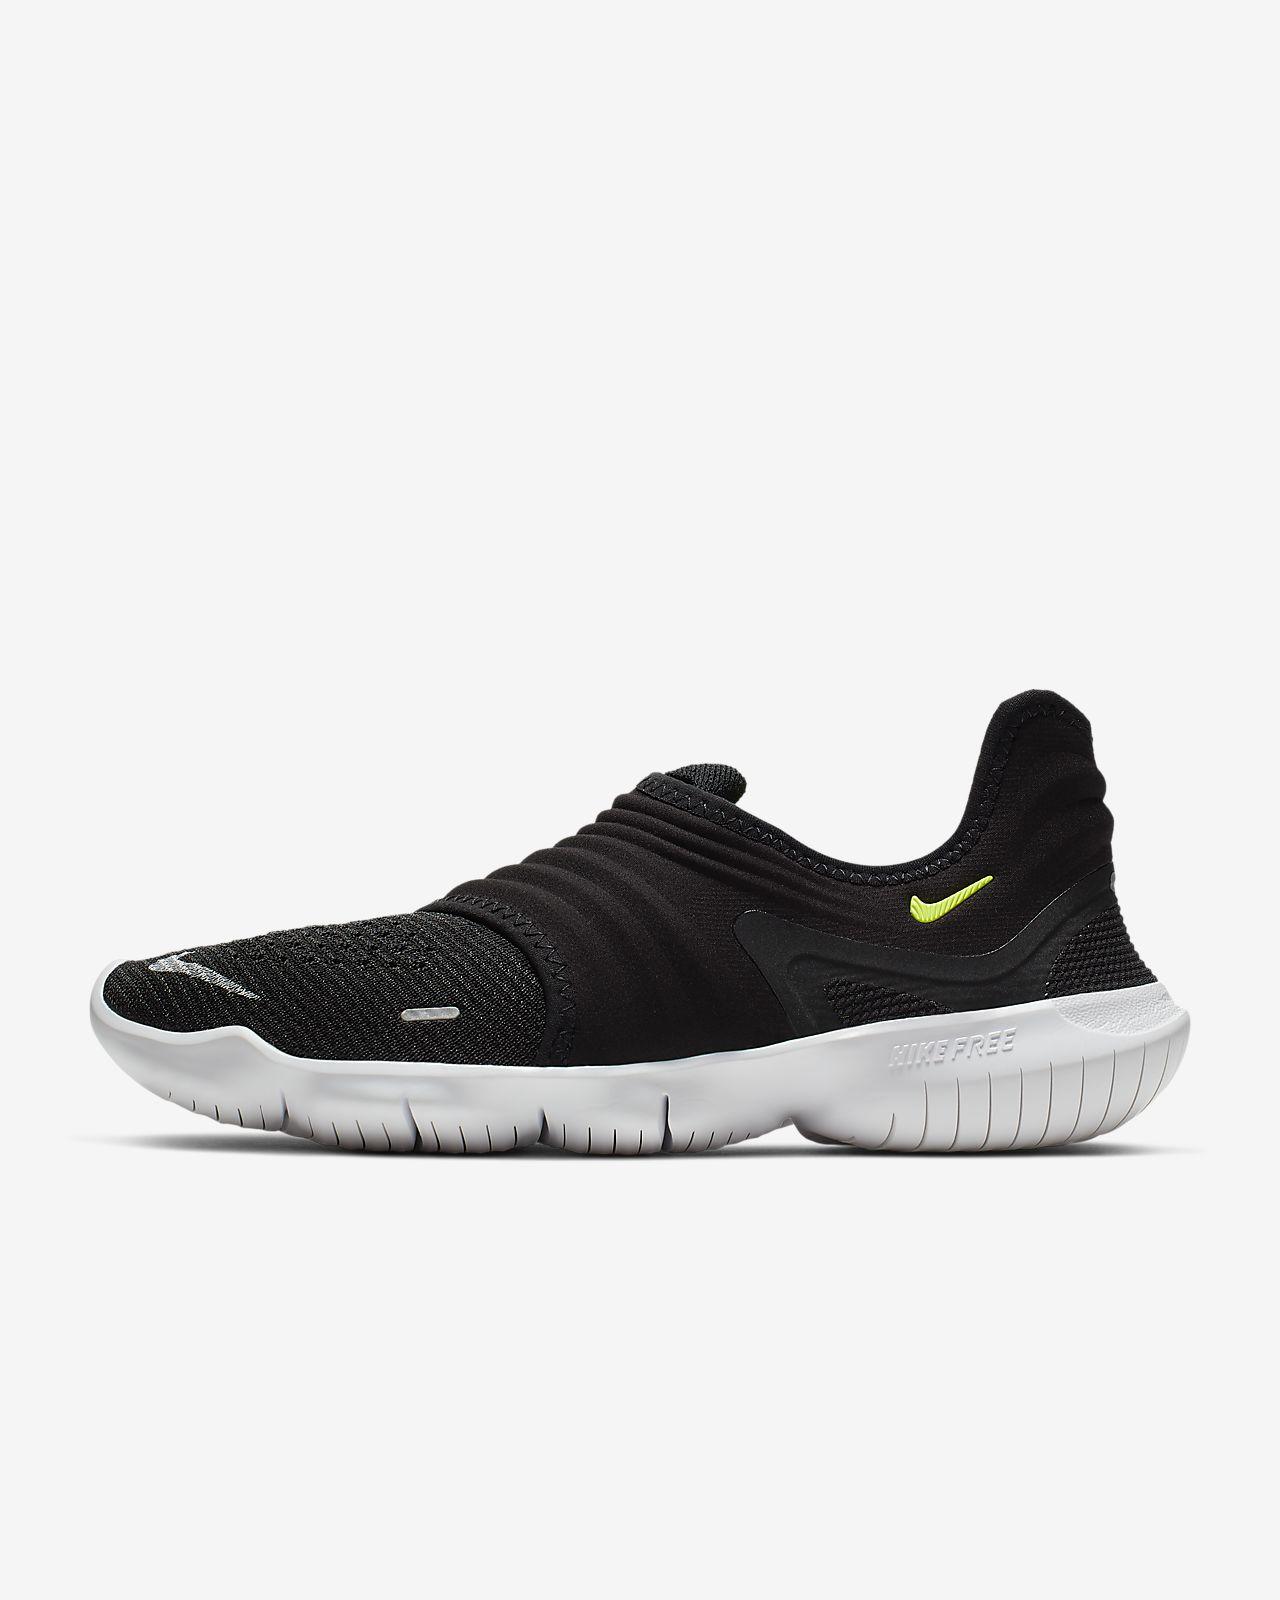 Wmns Nike Free 5.0 női futócipő , Női cipő   futócipő   nike